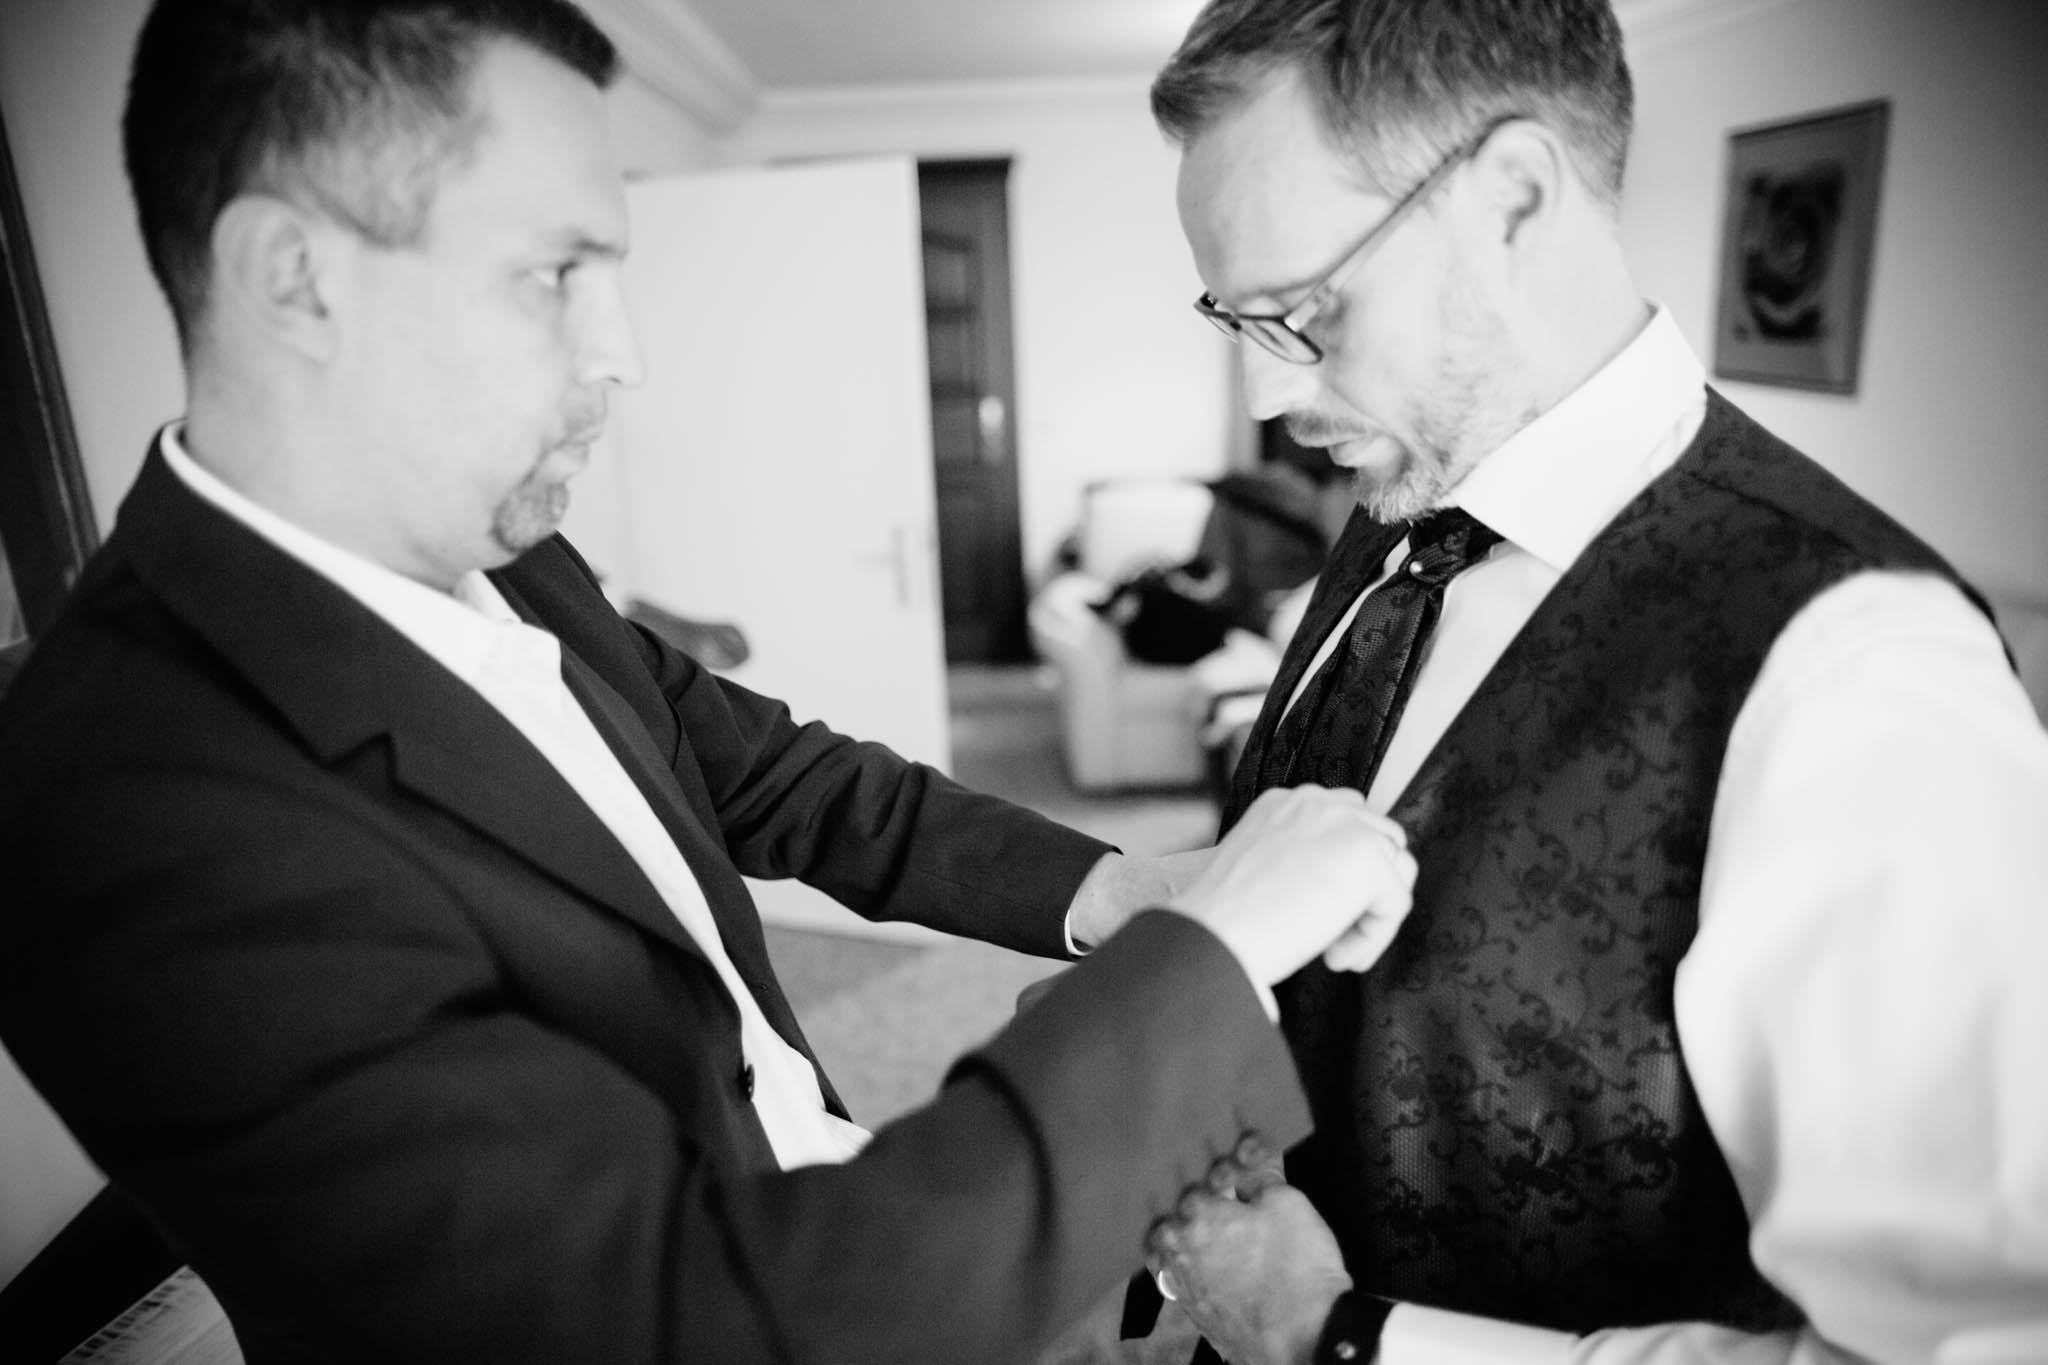 hochzeit-bräutigam-getting-ready